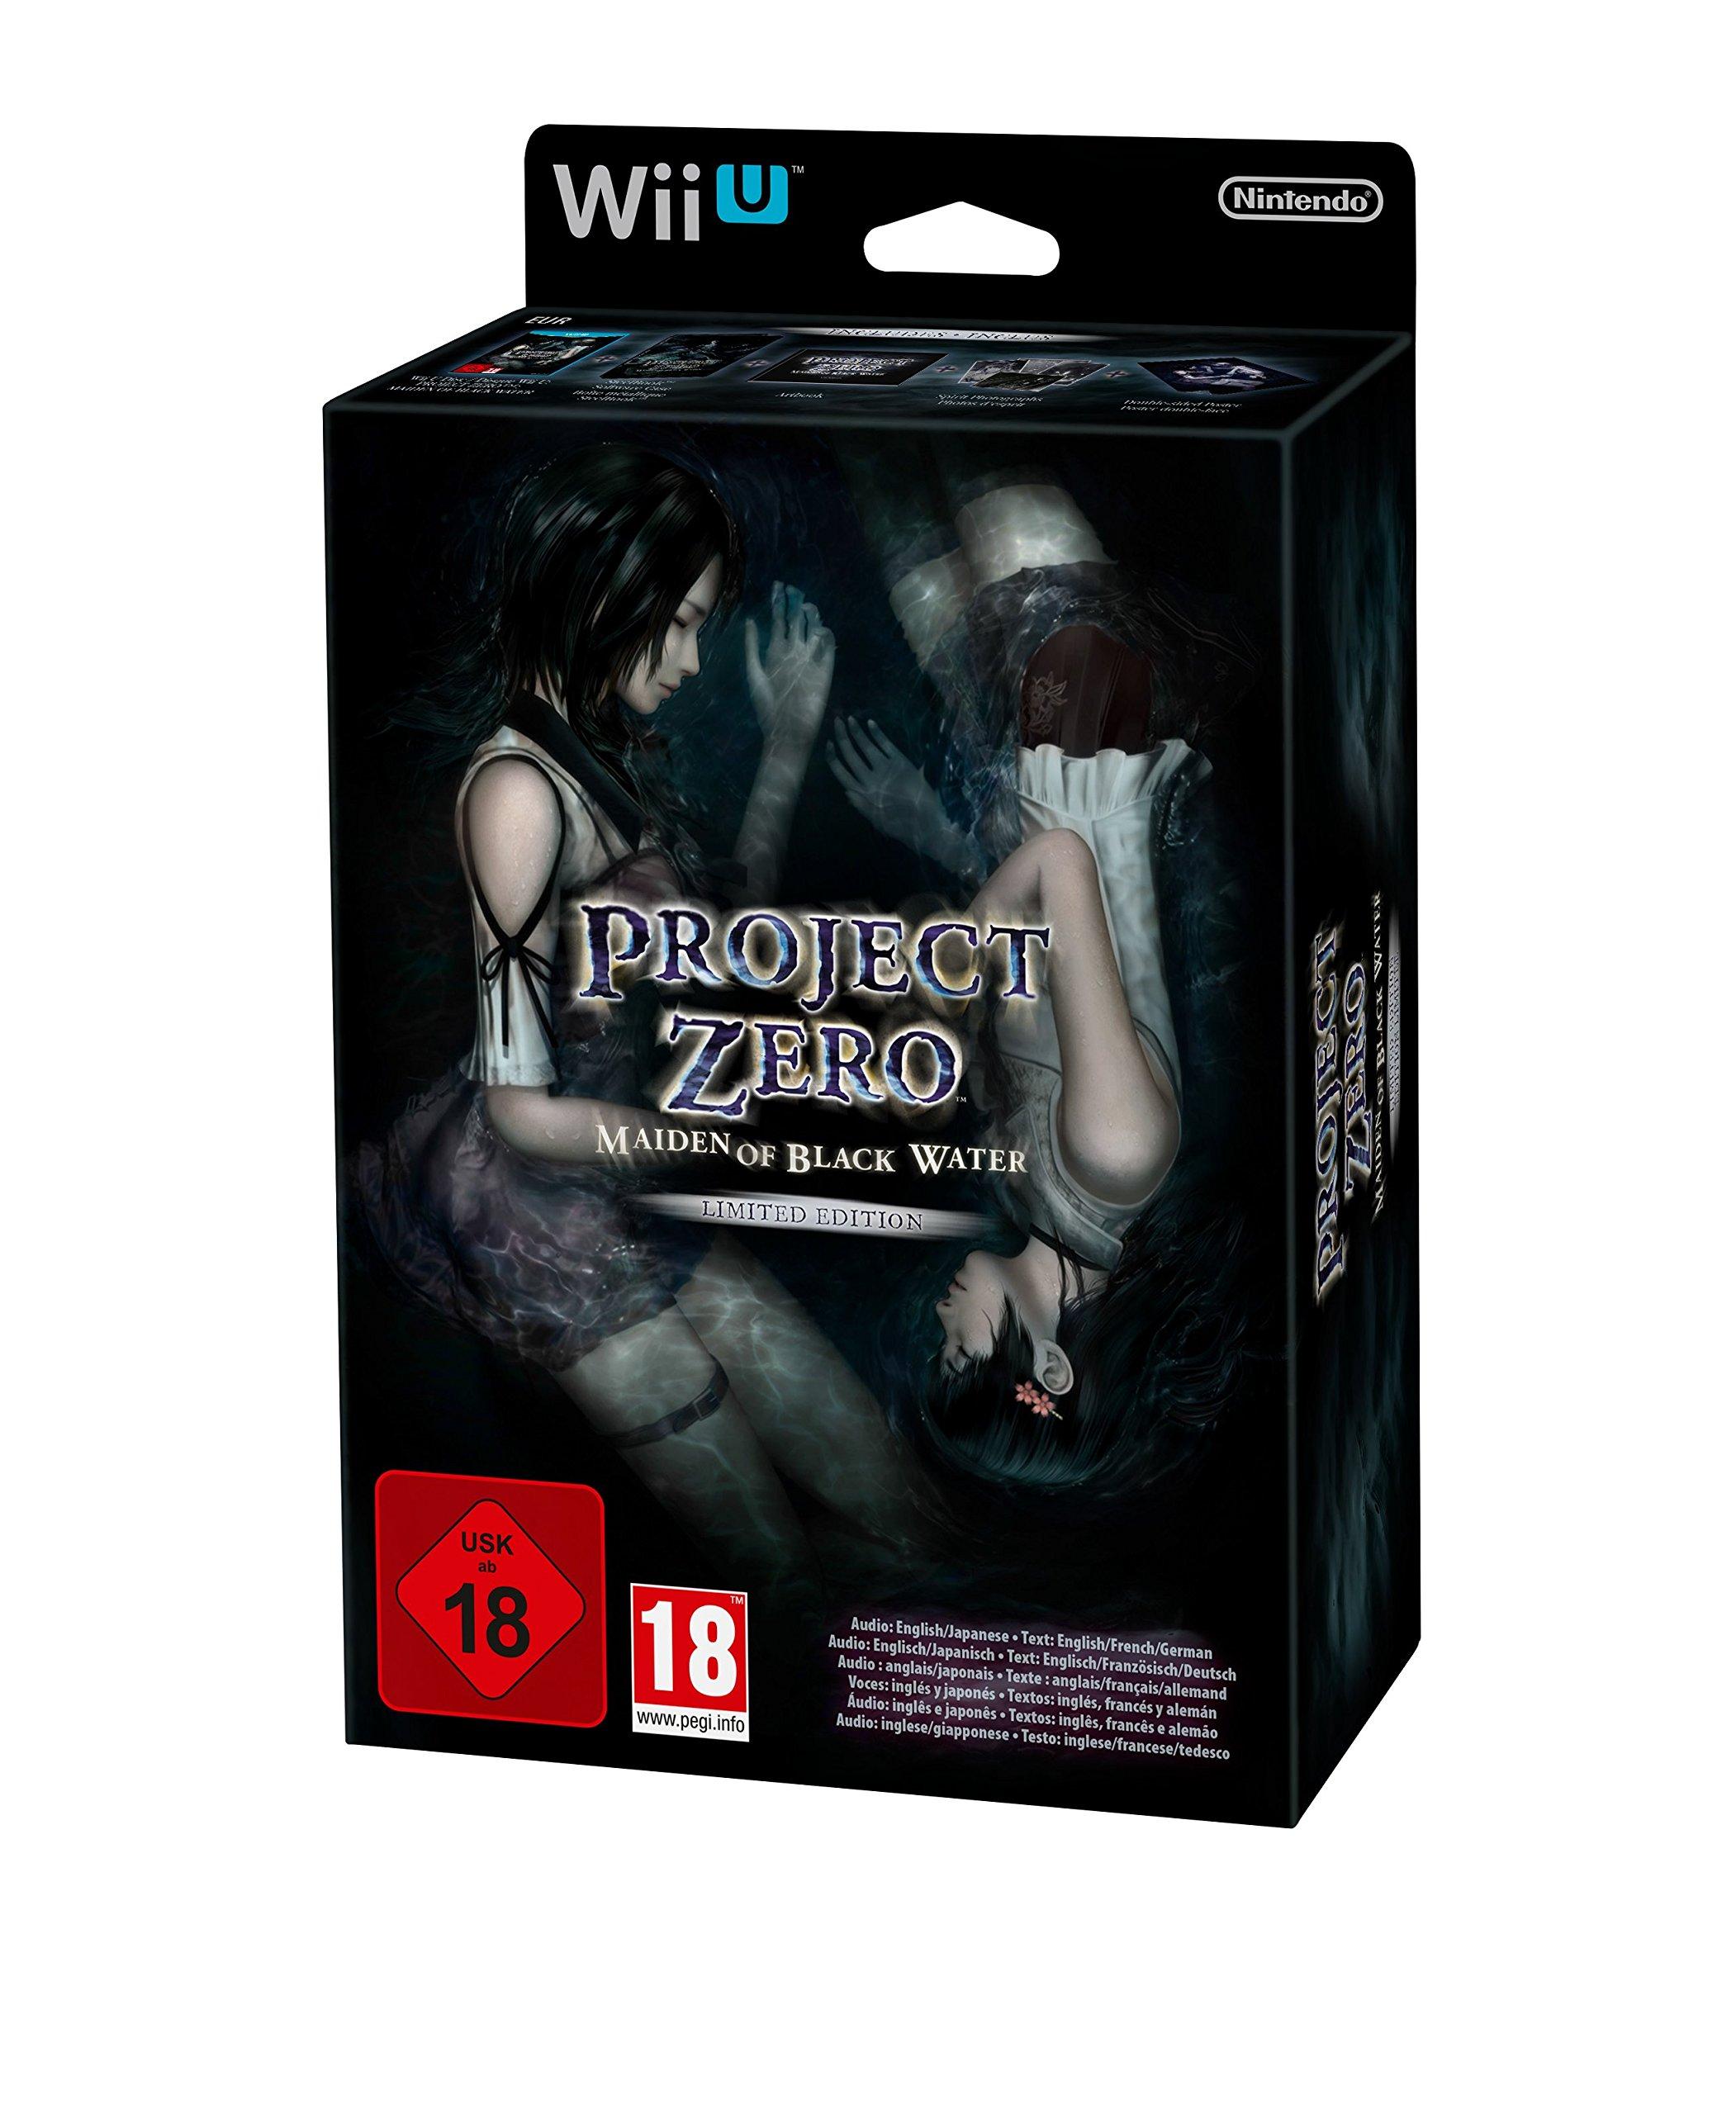 WiiU - Project Zero: Maiden of Black Water - Limited Edition [PAL EU]